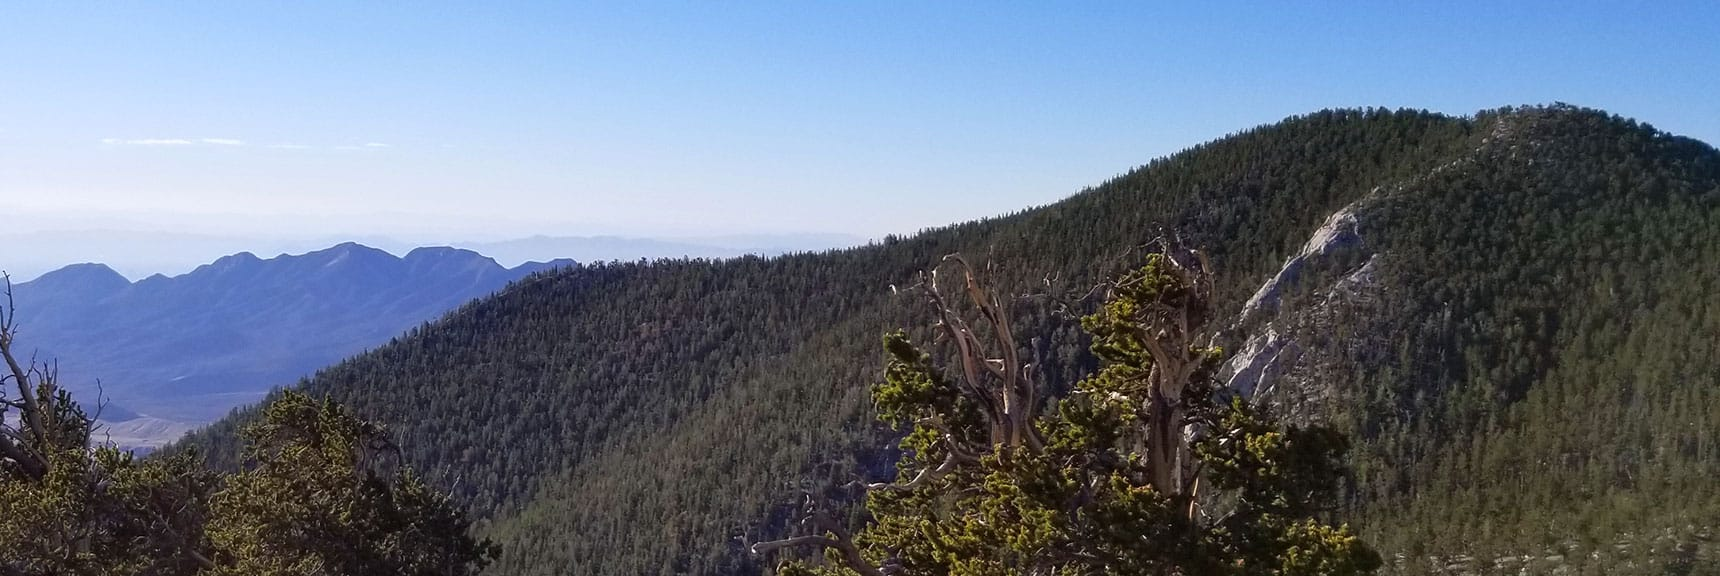 Fletcher Peak from Ridge Over North Loop Trail, La Madre Mt. in Background